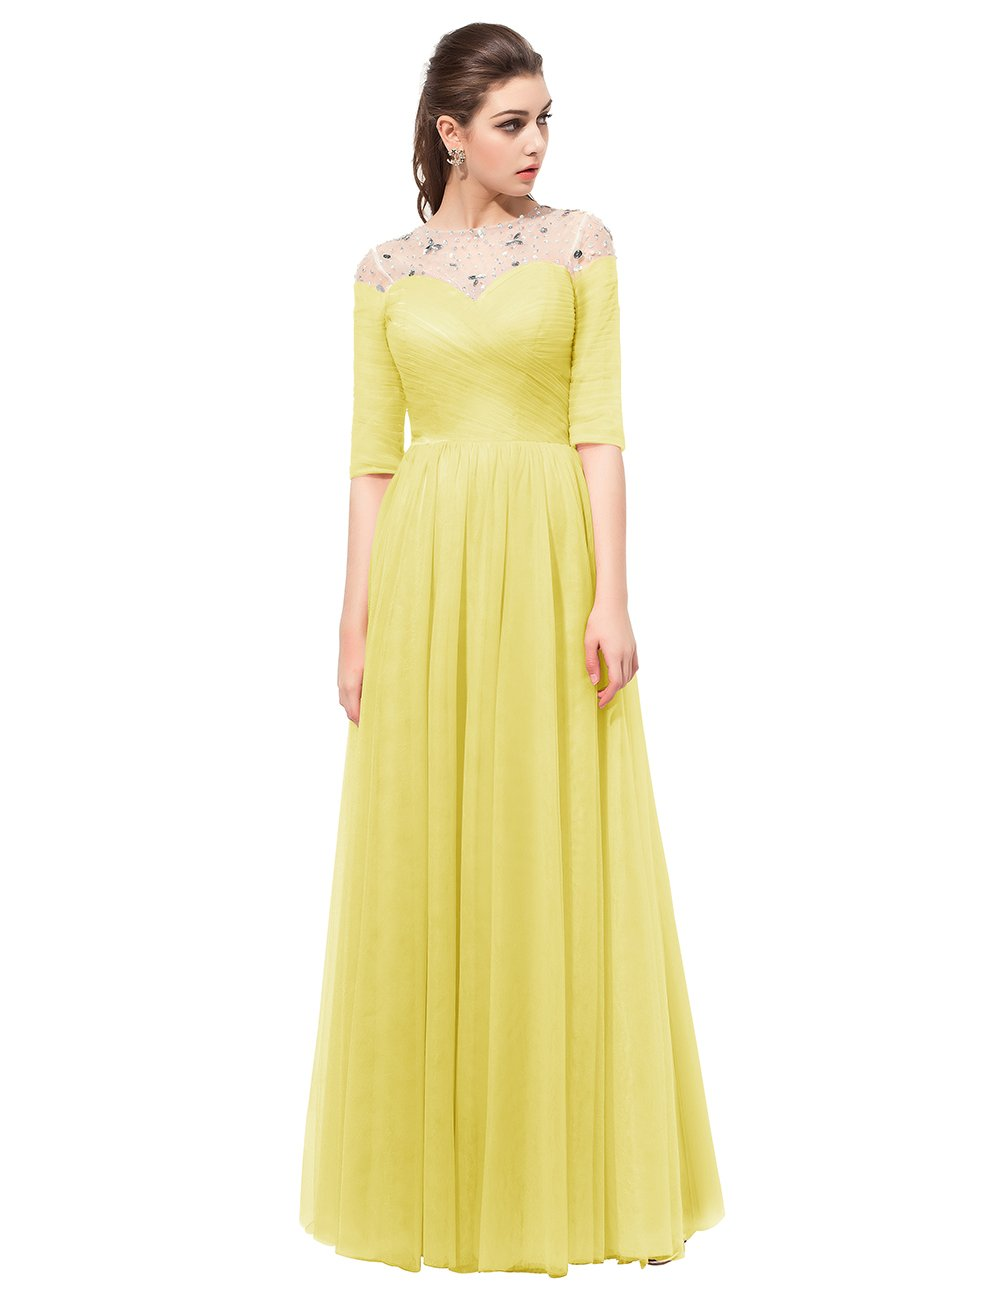 Dresstell レディーズ ロング丈 お呼ばれ 結婚式ドレス フォーマルドレス ビジュー付き カラーチュチュ 袖付き 花嫁ワンピース 二次会ドレス 編み上げ ダンスドレス B01NBR71AP JP5|イエロー イエロー JP5